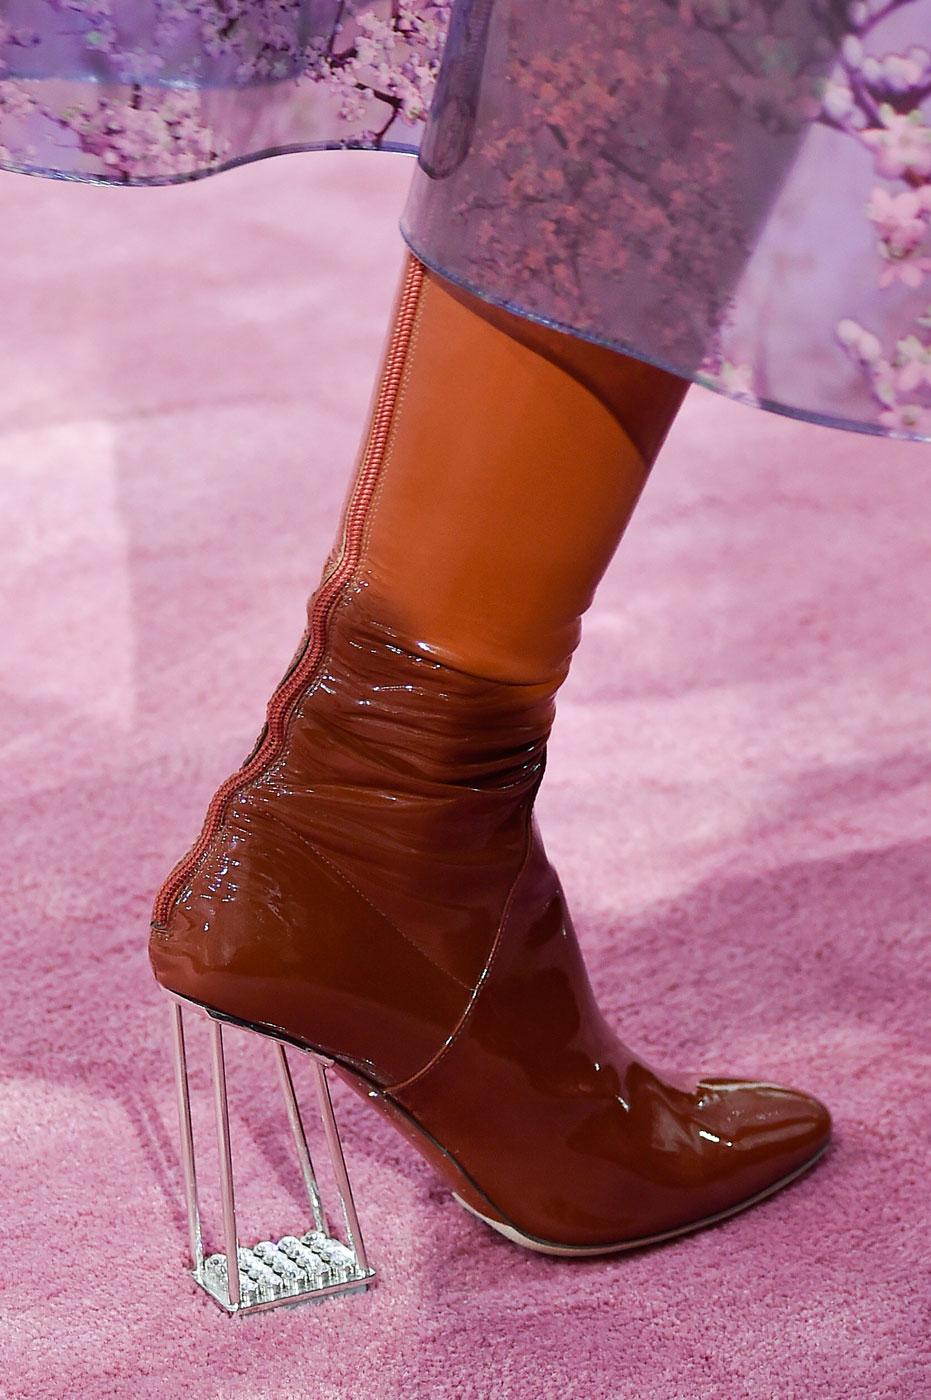 Christian-Dior-fashion-runway-show-close-ups-haute-couture-paris-spring-summer-2015-the-impression-073